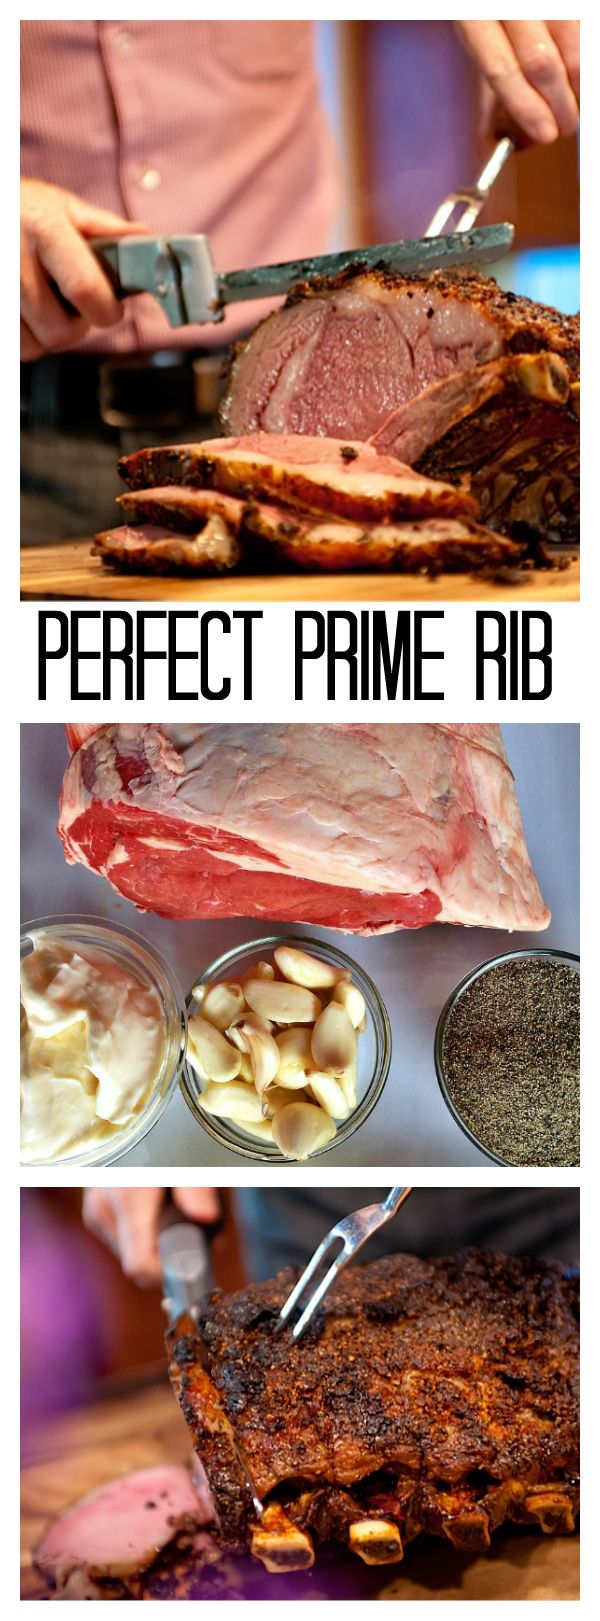 Crusted Pepper Prime Rib